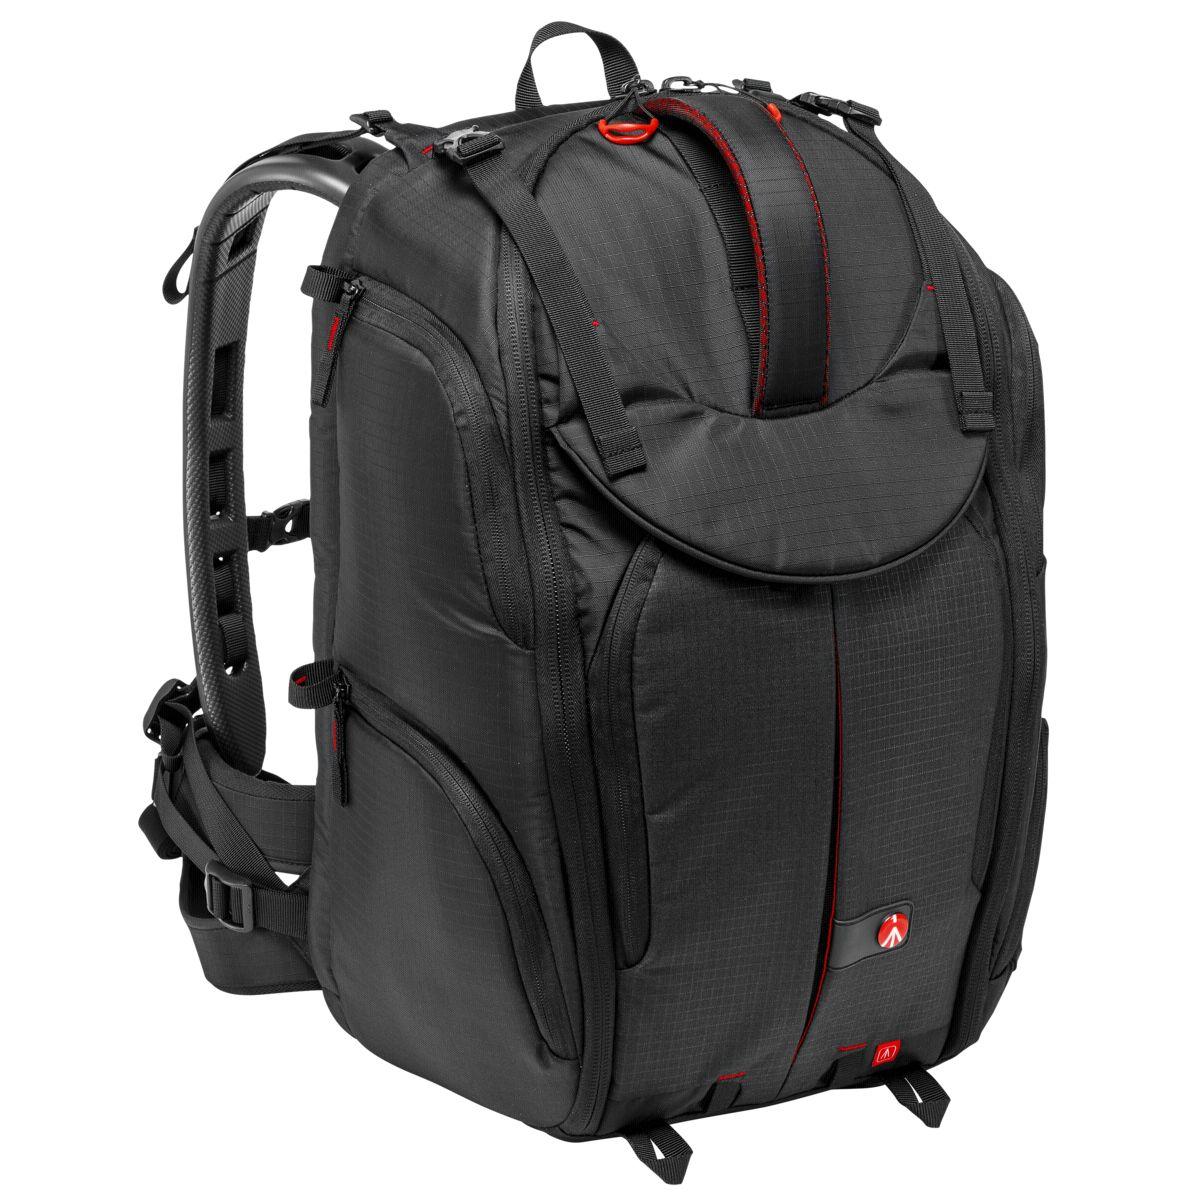 6f7d1009d2c56 Manfrotto Fototasche »Pro Light Video Rucksack Pro-V-410 PL«